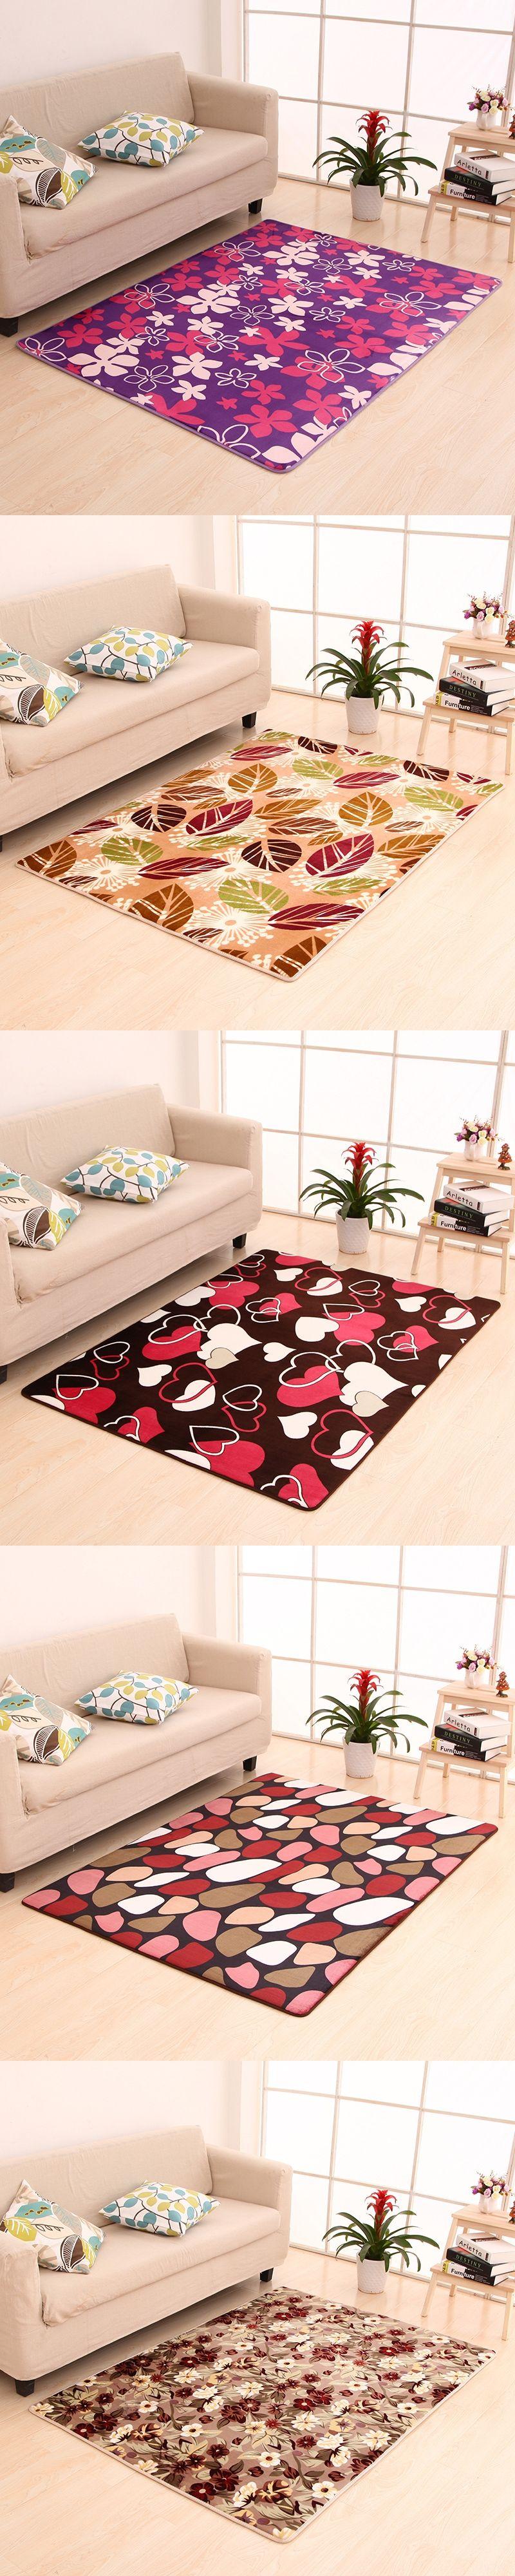 sizes carpet livingroom modern art coral fleece floor mat bedroom